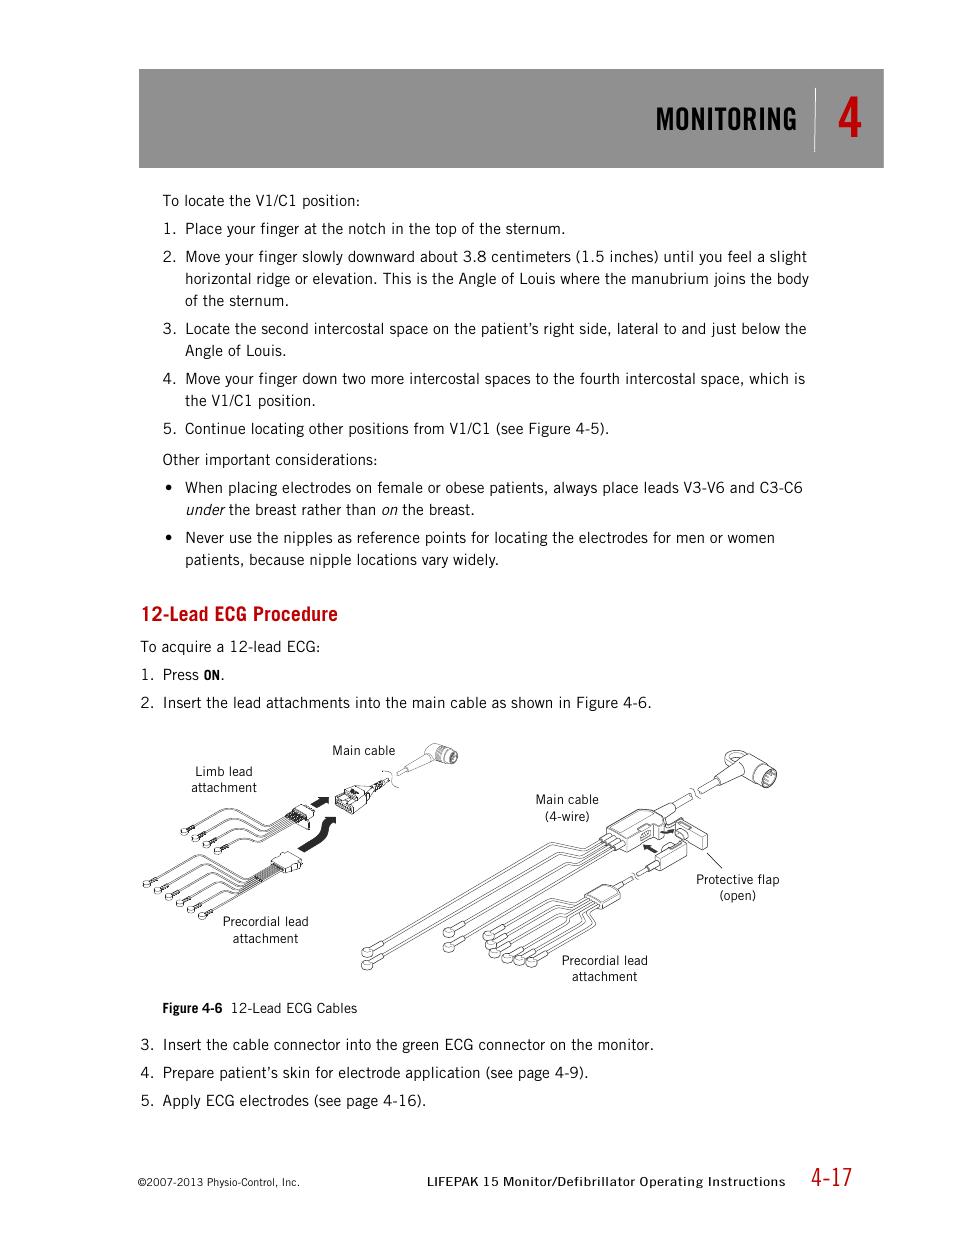 Lead ecg procedure, Monitoring | Physio-Control LIFEPAK 15 User Manual |  Page 61